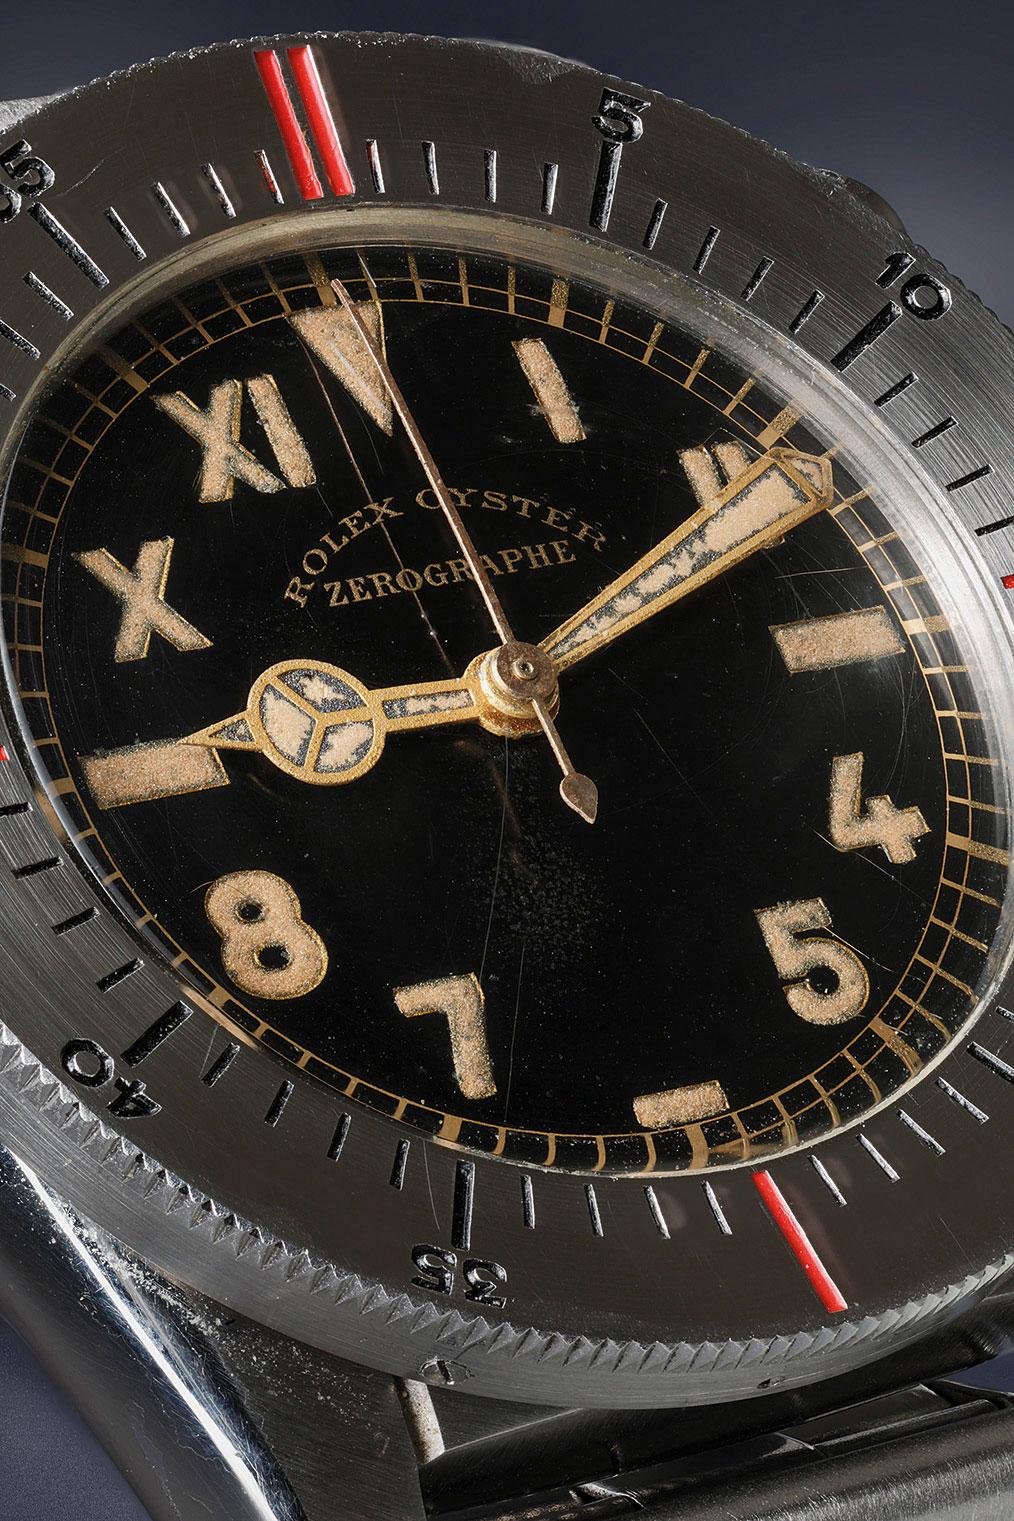 Rolex Zerographe california dial